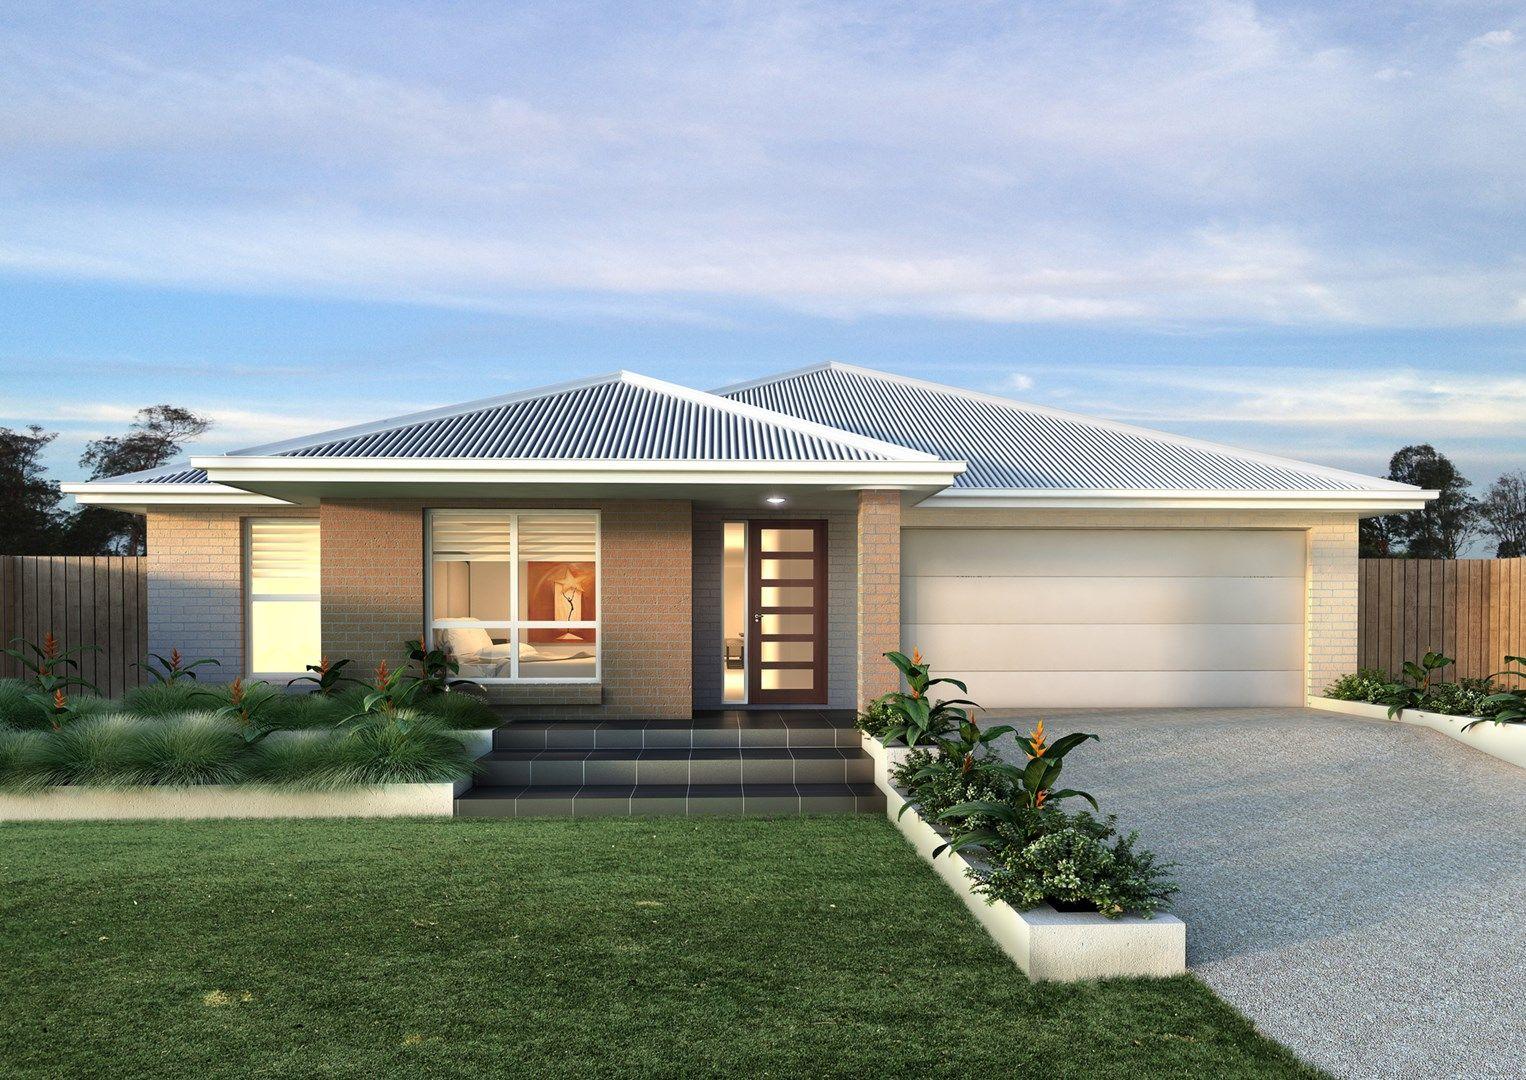 Lot 240 Tallowwood Drive, Gunnedah NSW 2380, Image 0